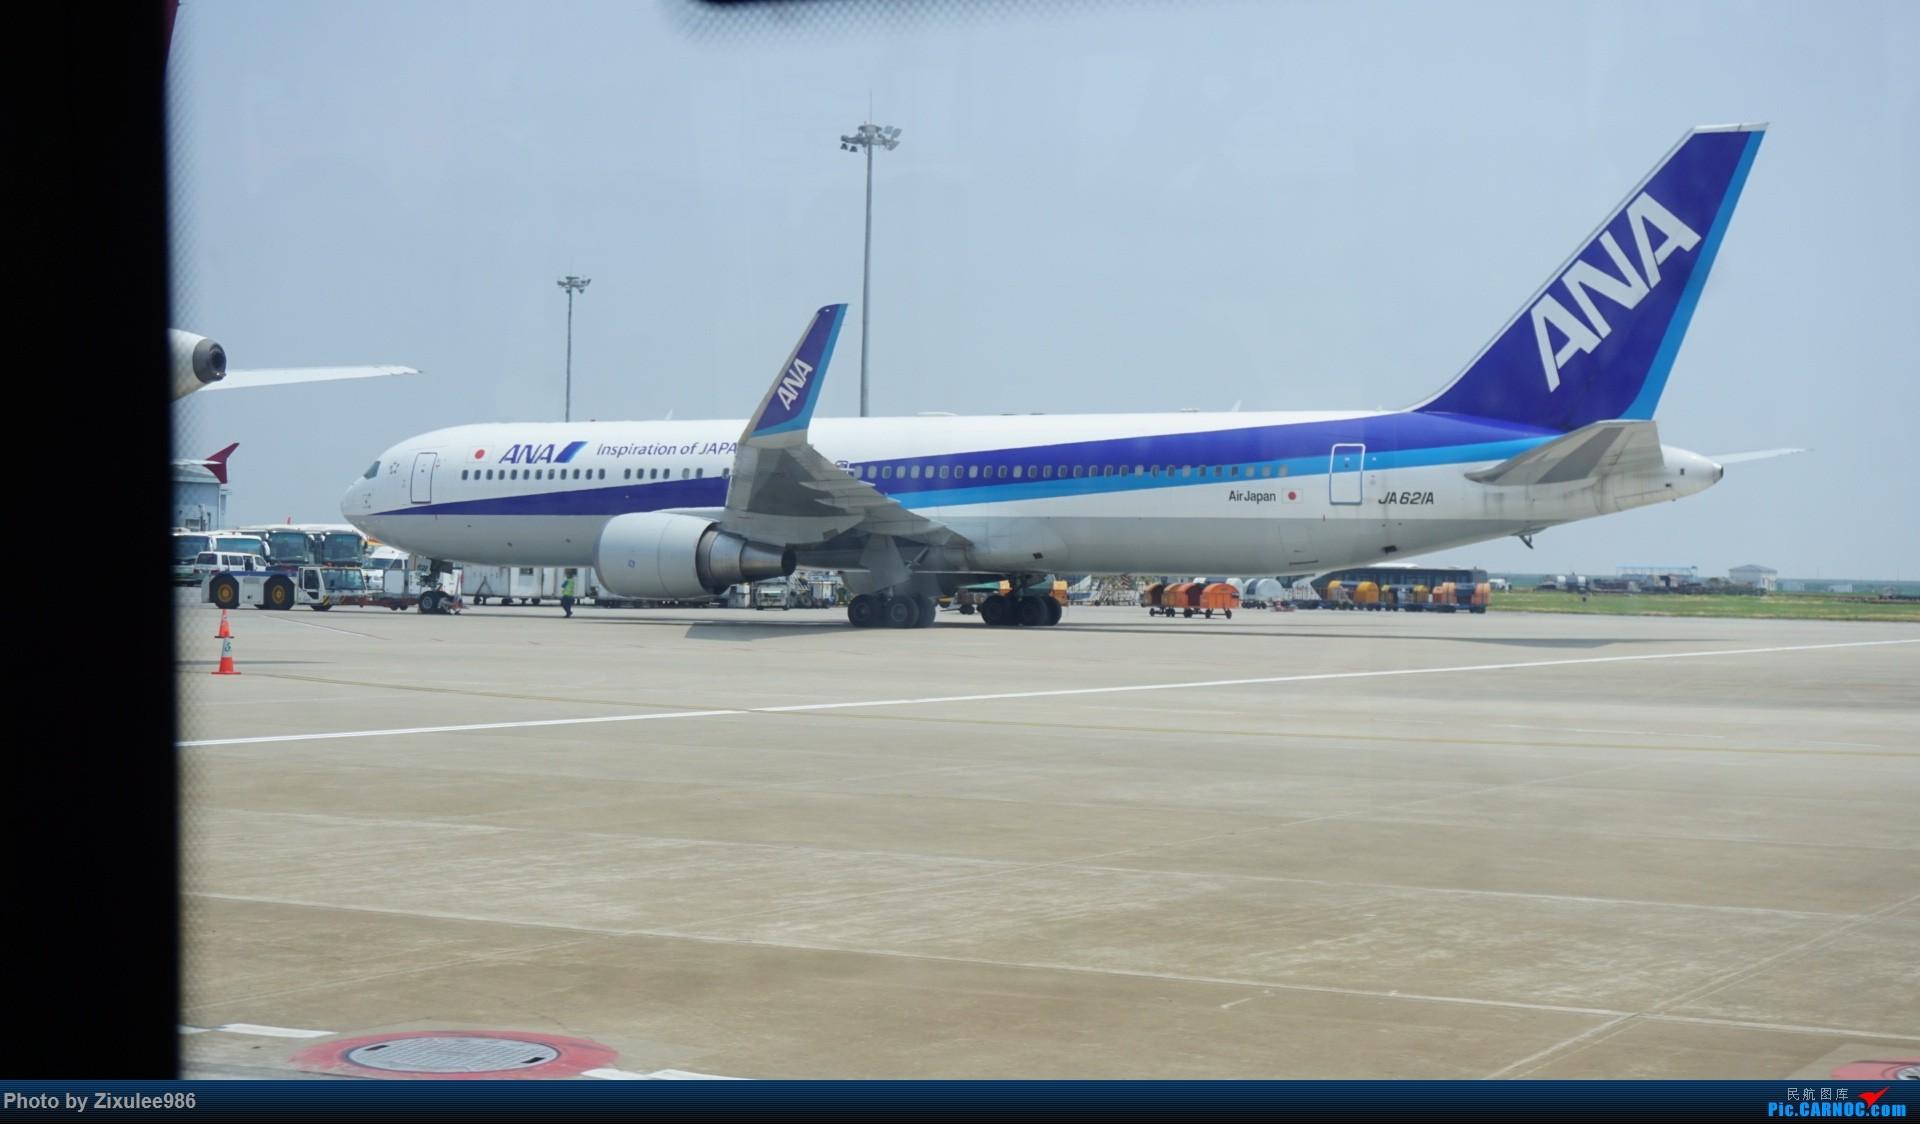 Re:[原创]日本关东关西游记之台风天坐飞机的感受:猛颠、复飞、盘旋、备降、延误... ... BOEING 767-381(ER) JA621A 中国上海浦东国际机场